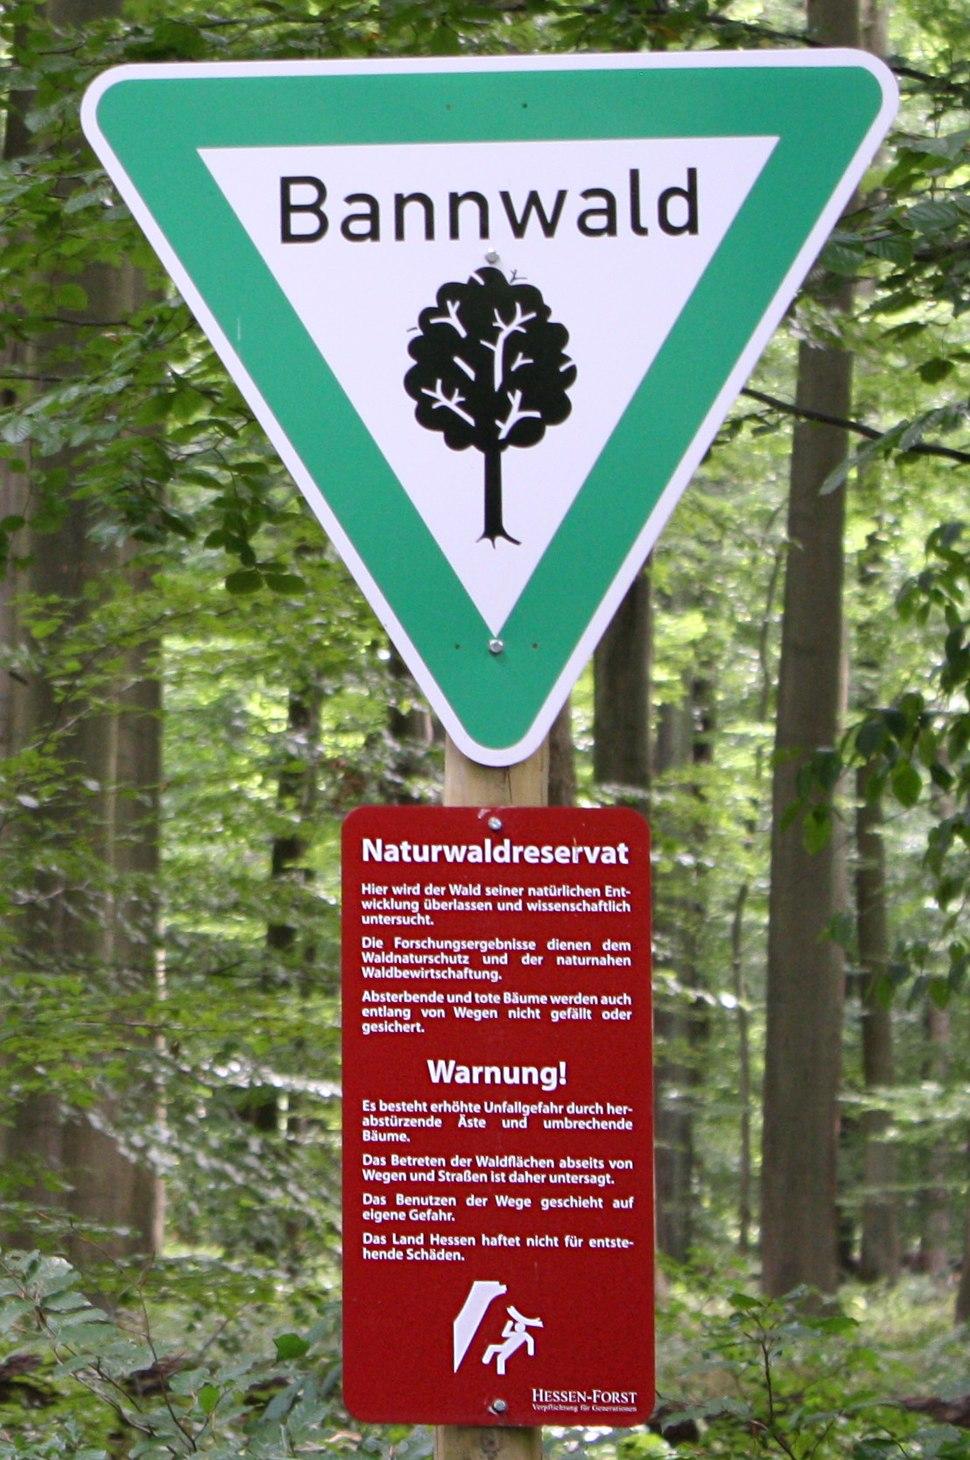 Bannwald rockenberg4